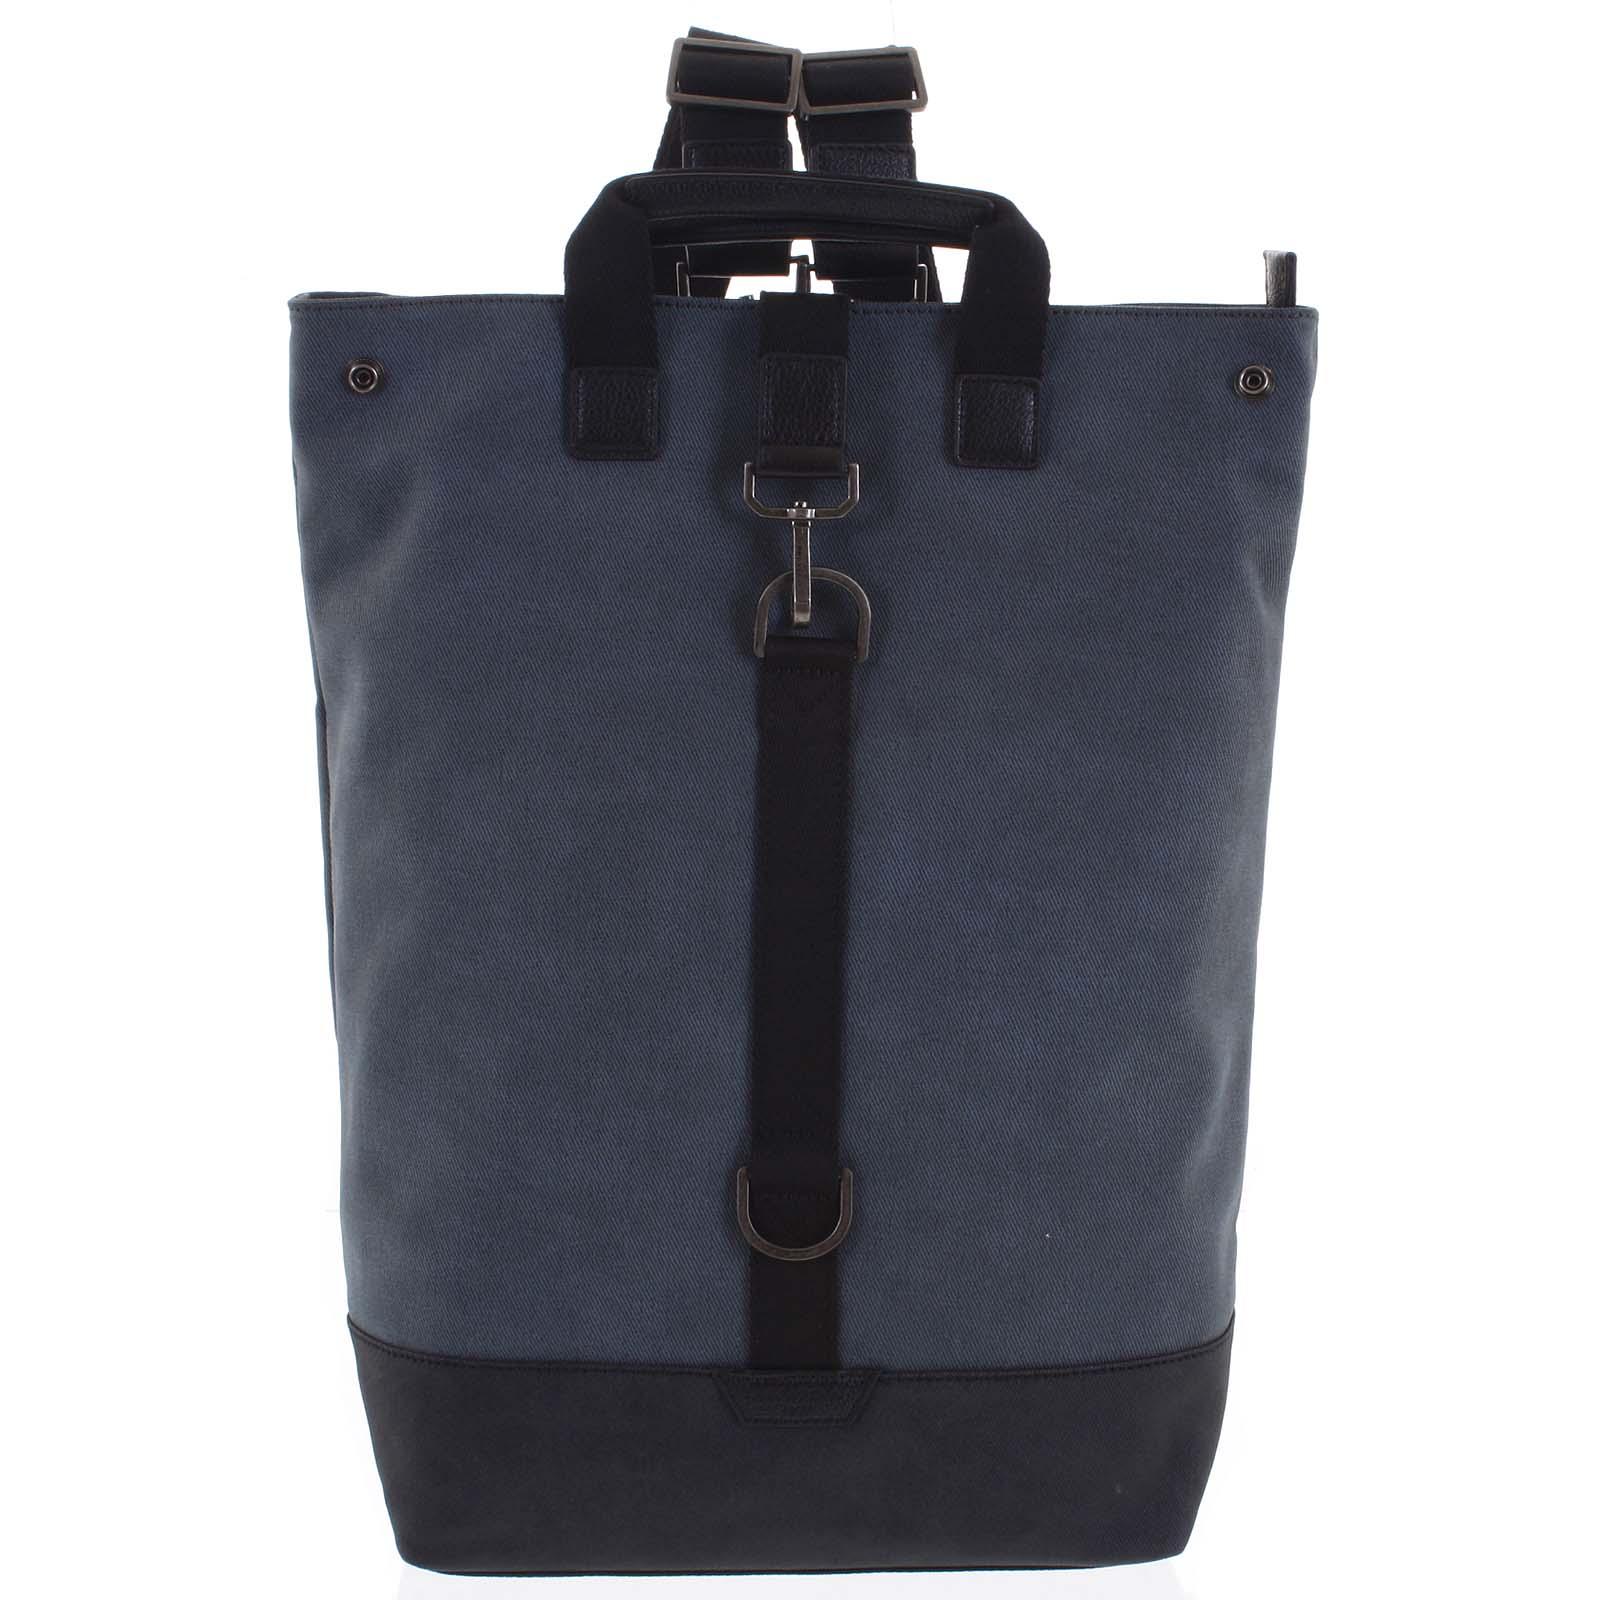 Pánský velký batoh modrý - Hexagona Adrien